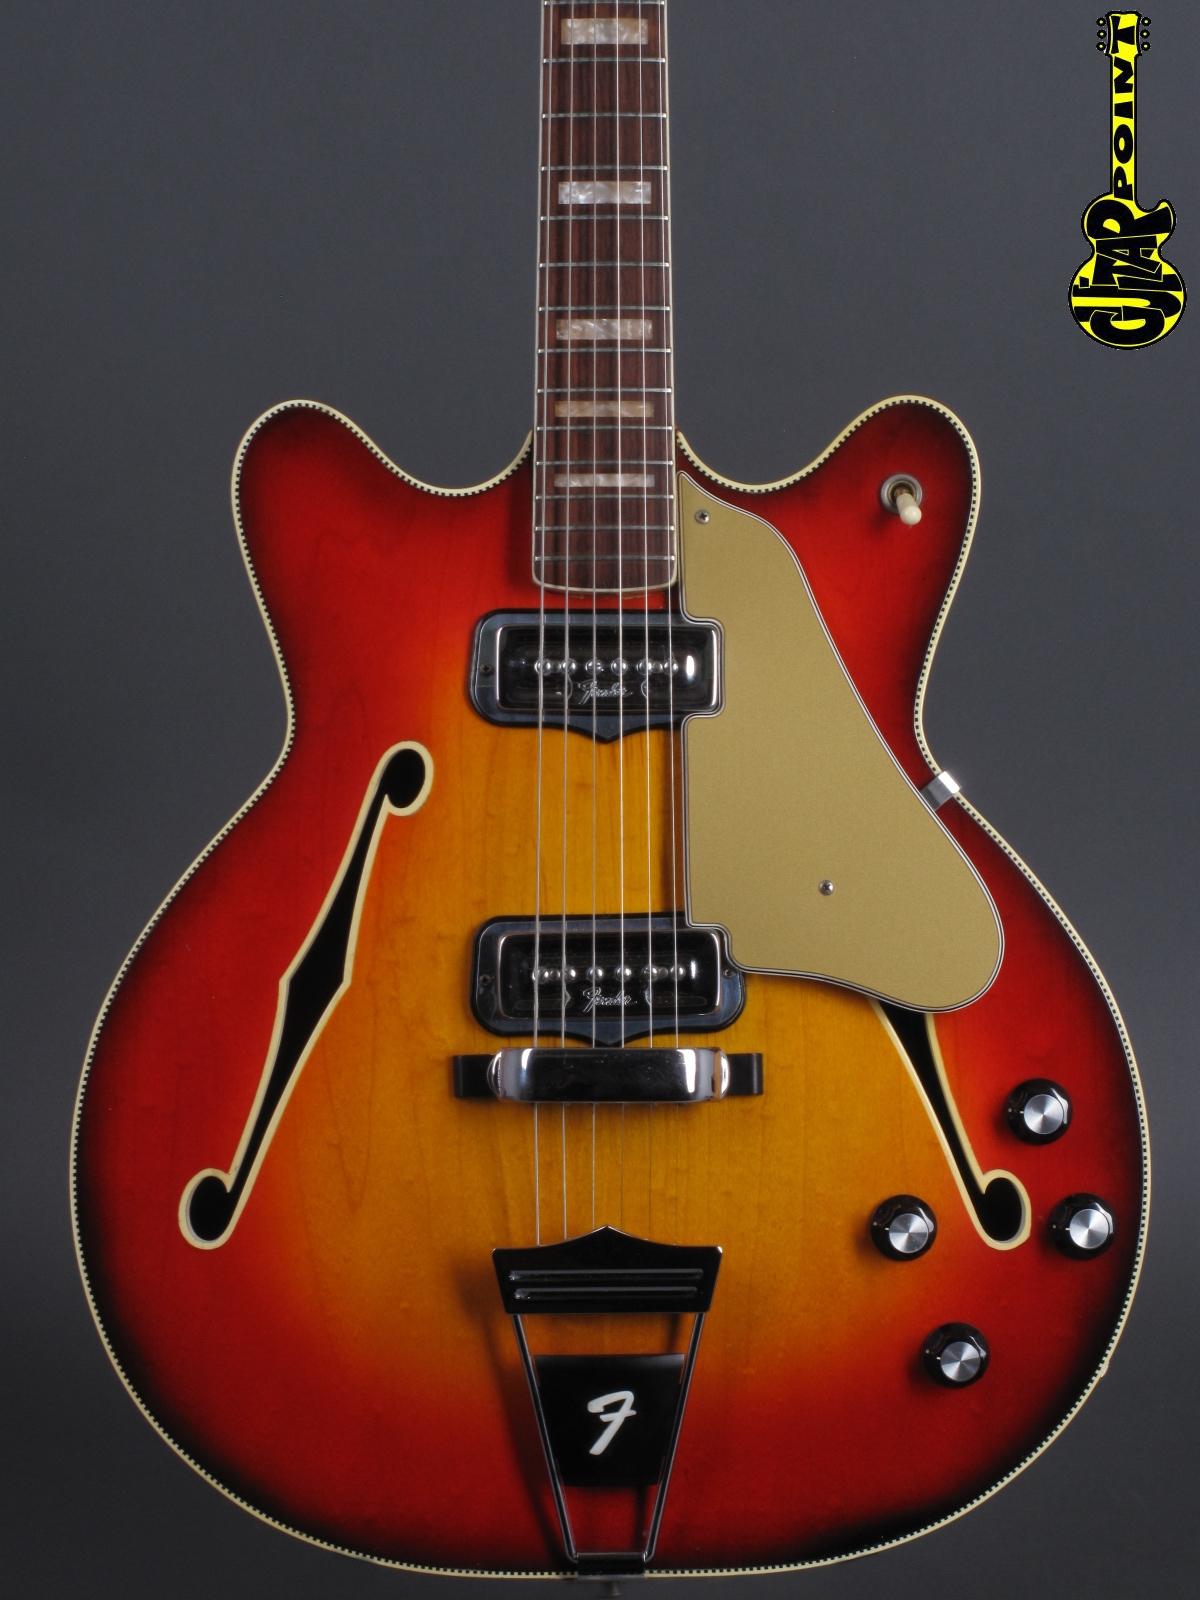 1967 Fender Coronado II - Sunburst